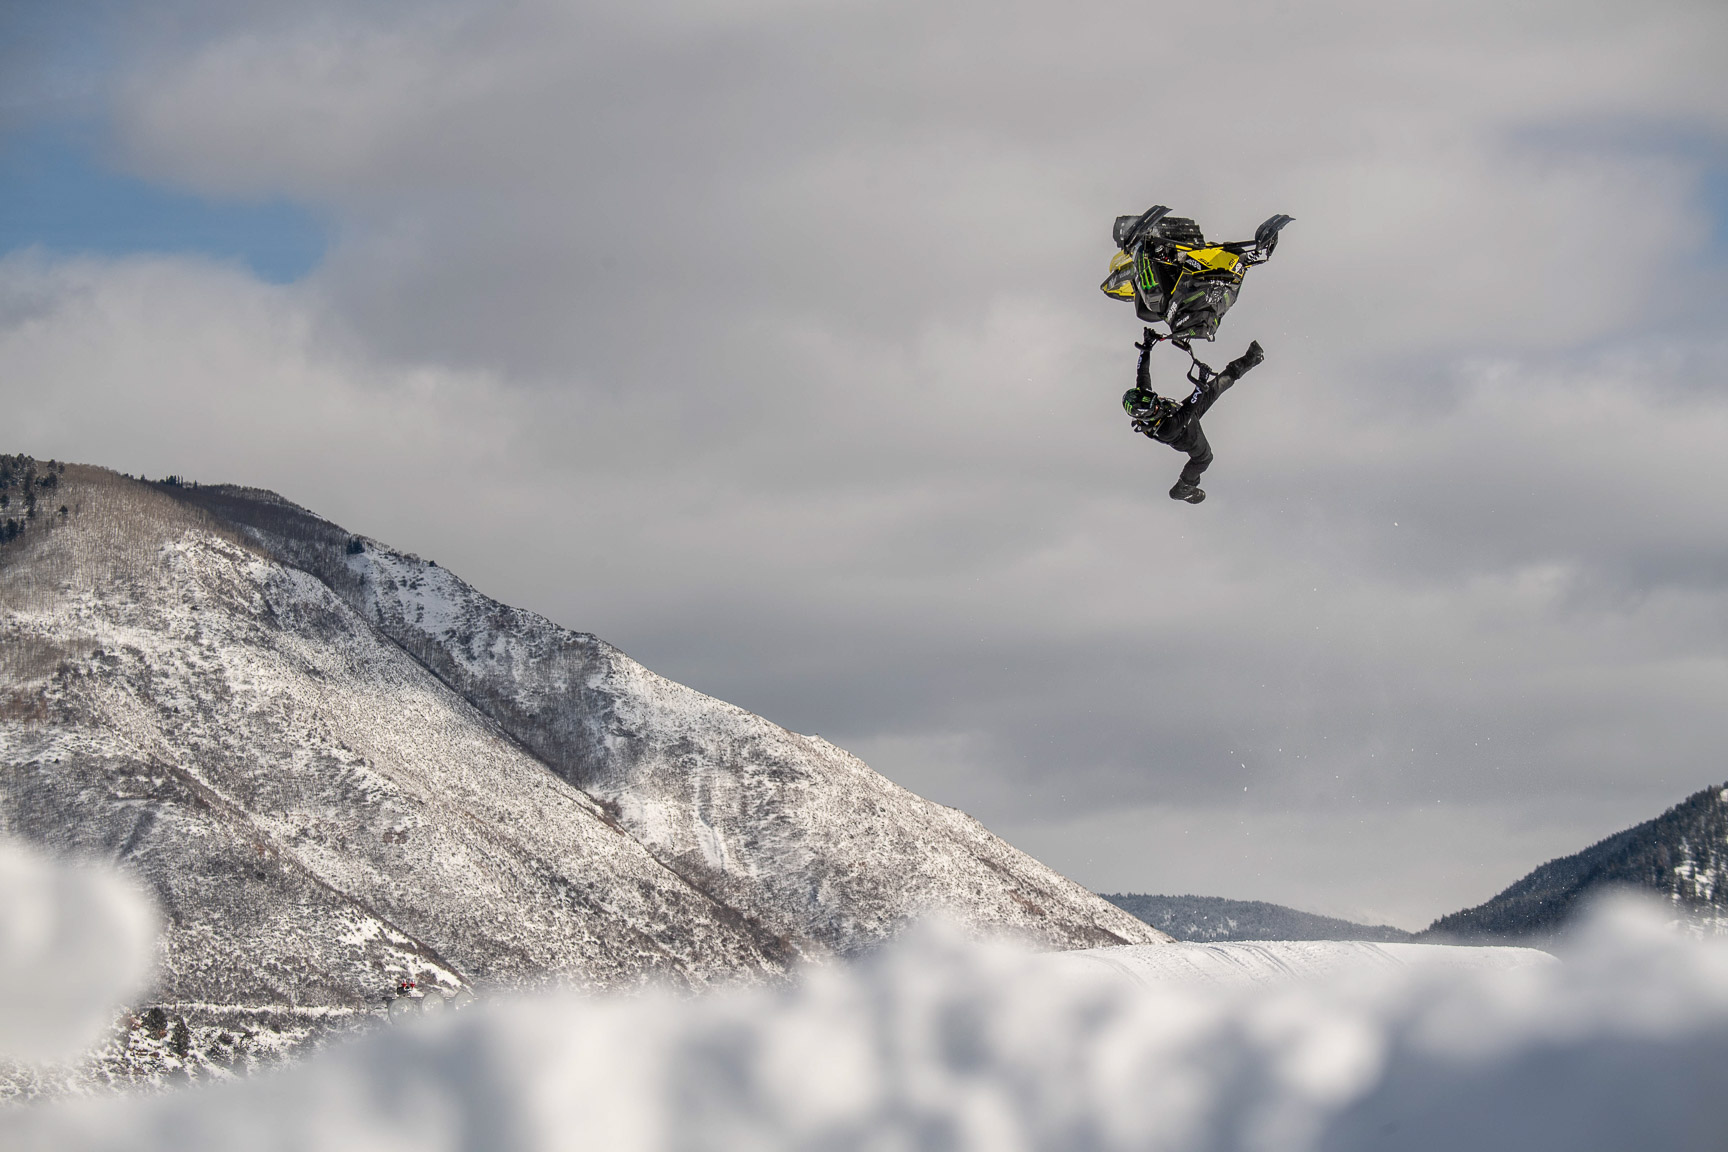 Joe Parsons, Snowmobile Freestyle practice